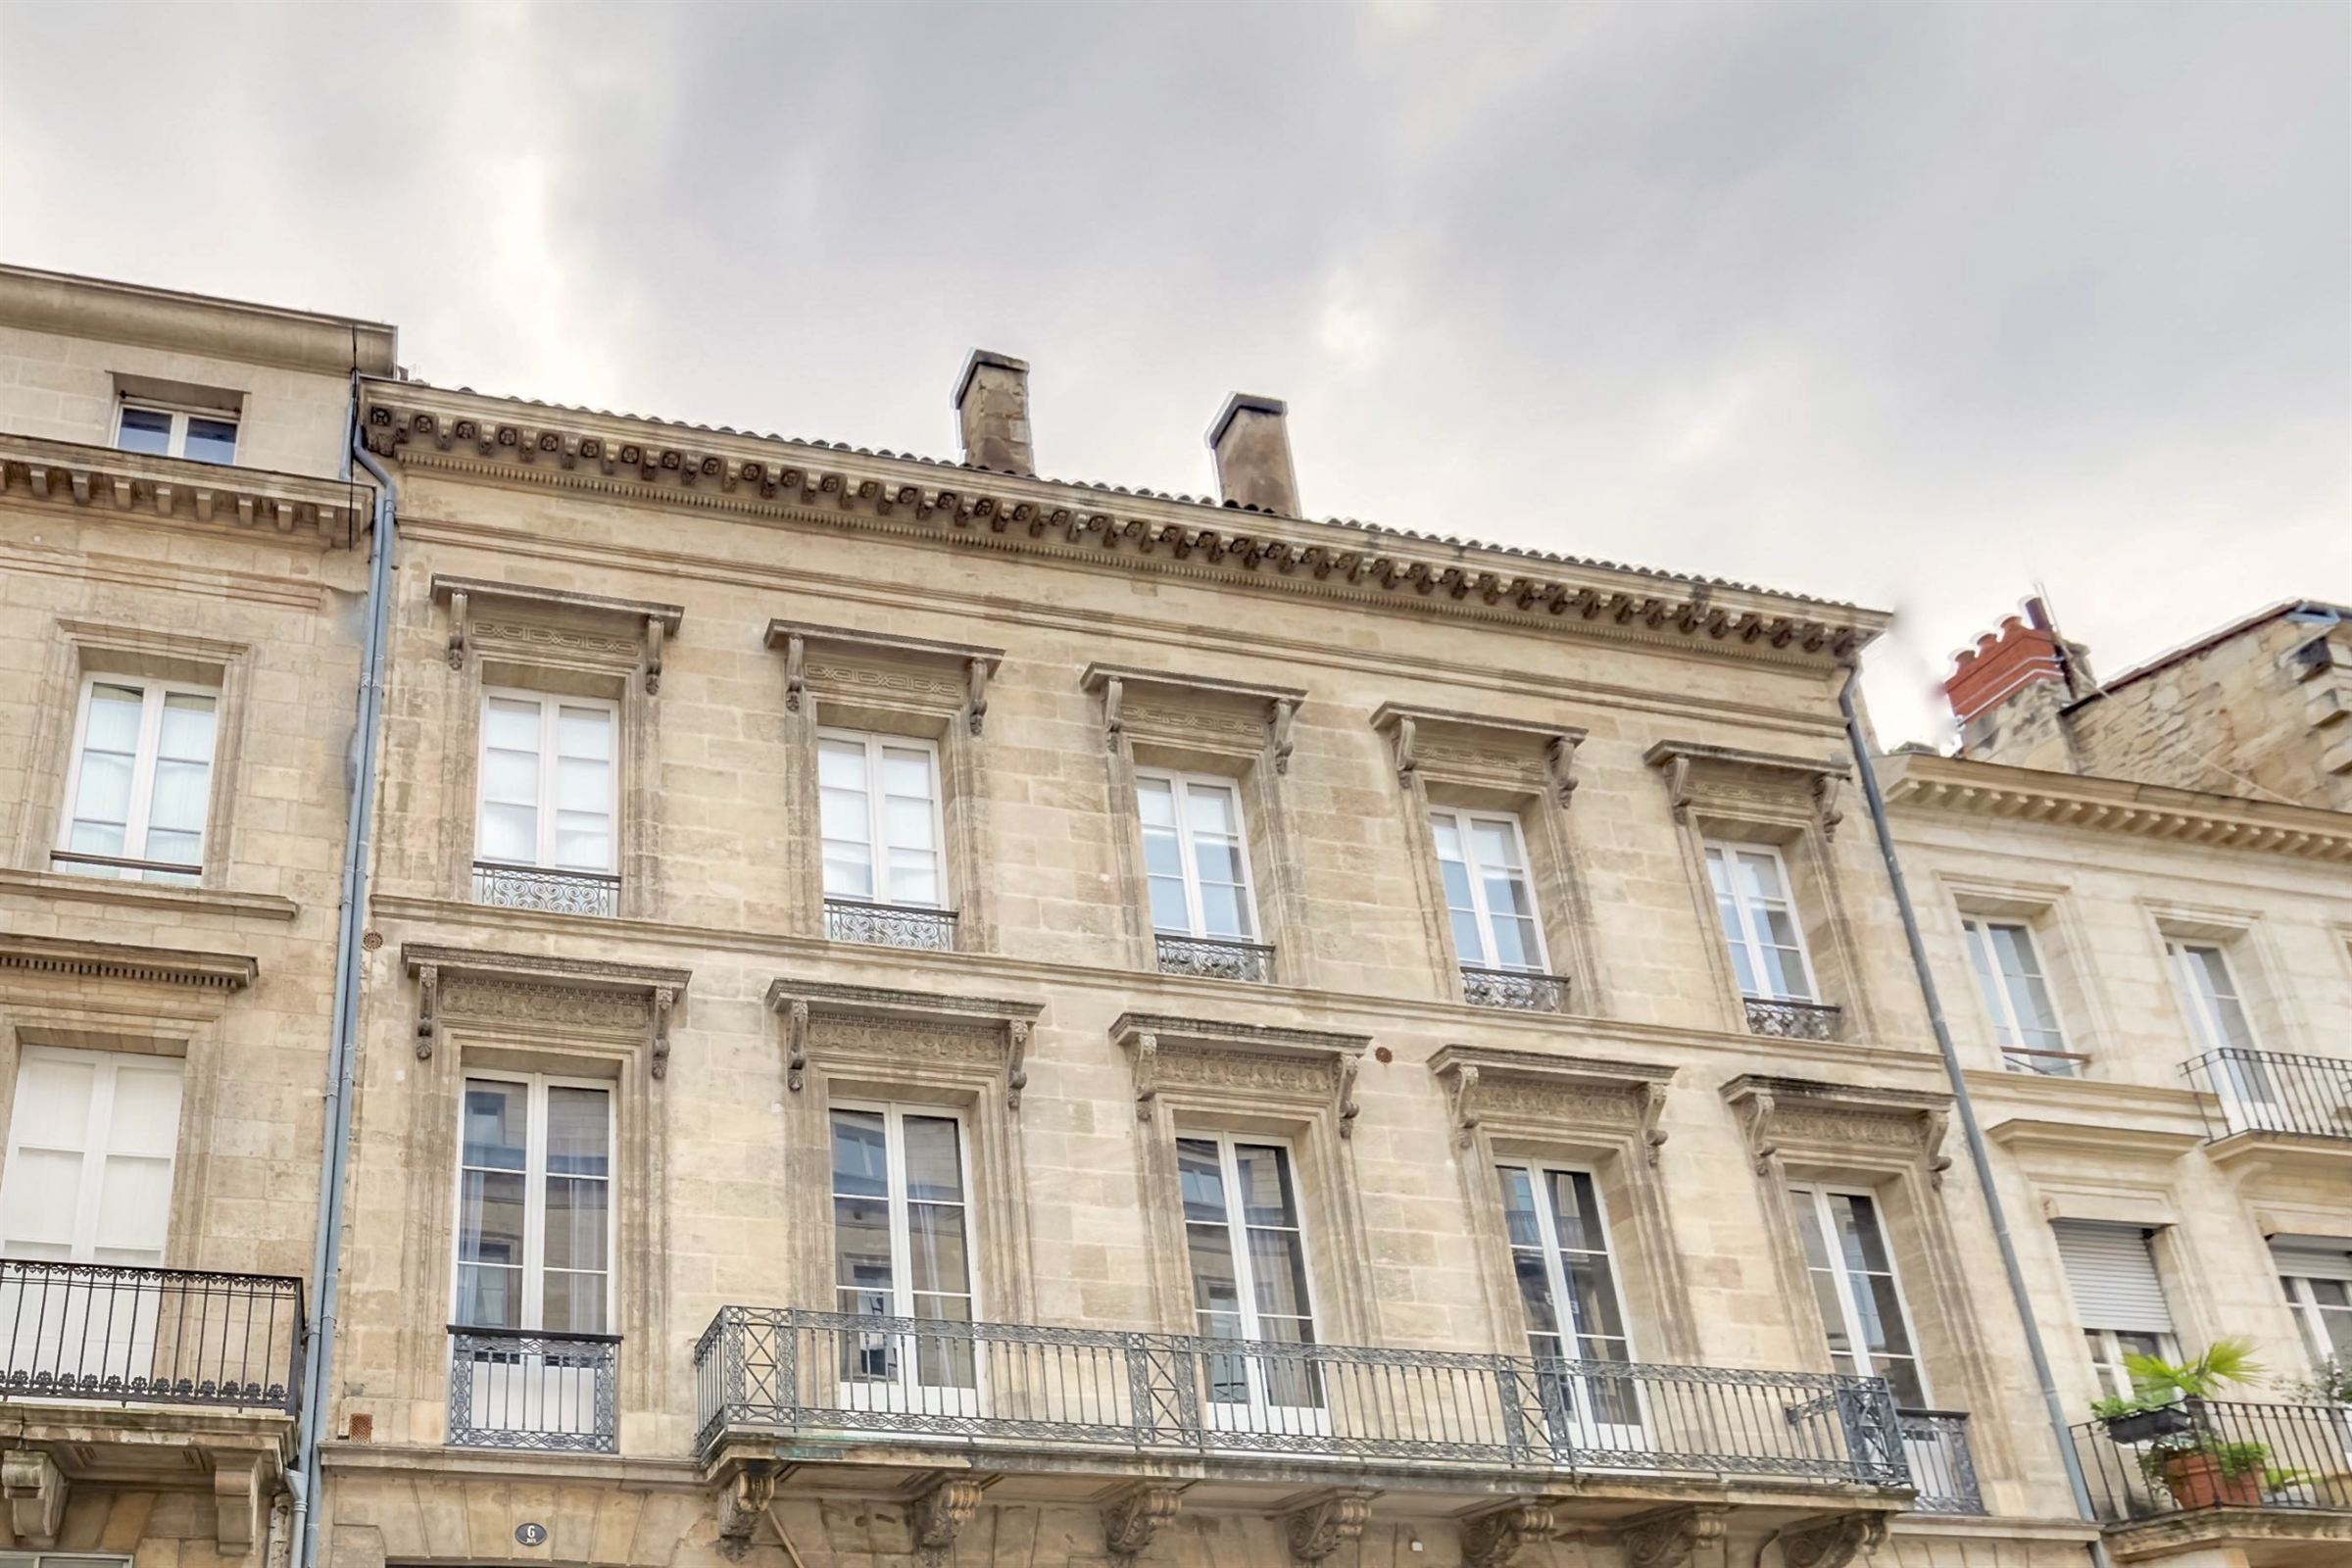 Apartamento por un Venta en DOWNTOWN BORDEAUX - VAST 4 BEDROOM DUPLEX WITH 2 TERRACES AND PARKING SPACES Bordeaux, Aquitania, 33000 Francia